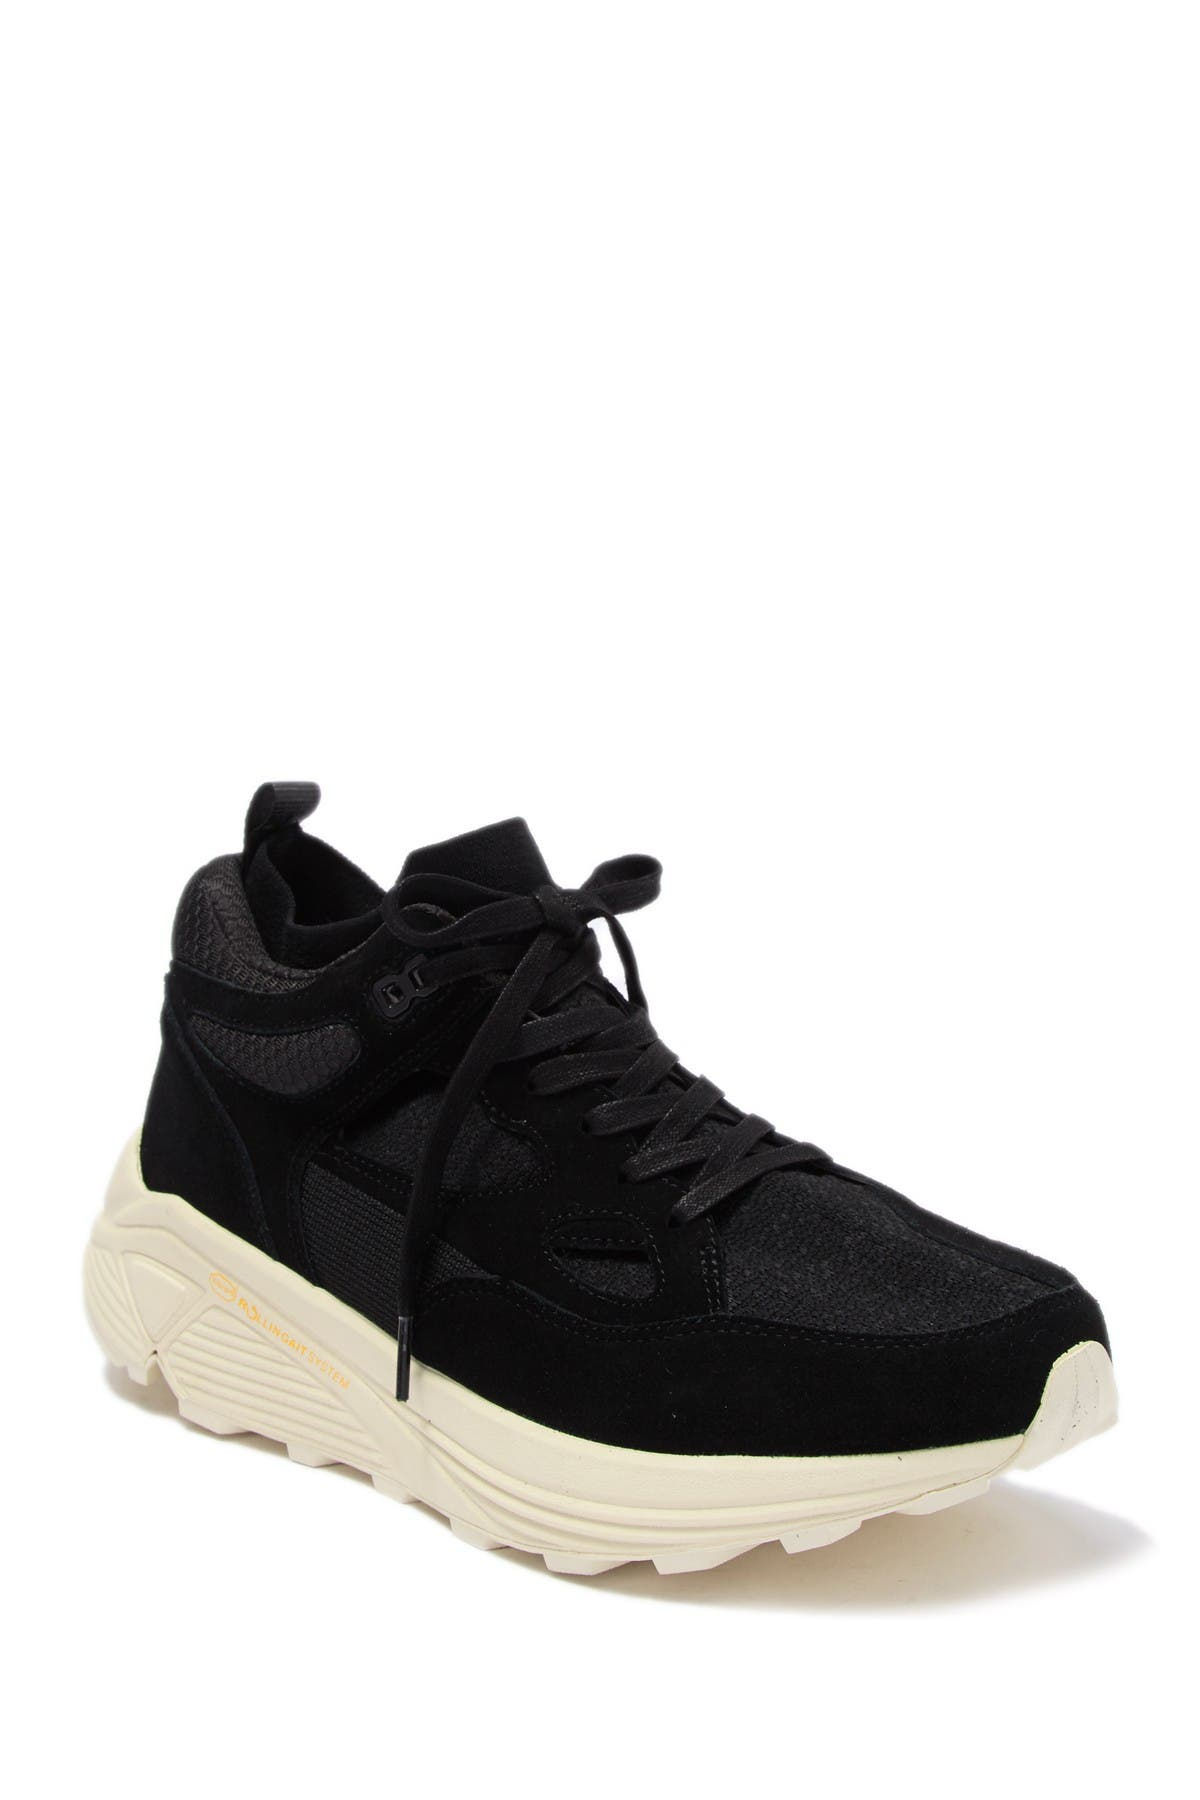 Image of Brandblack Aura Sneaker